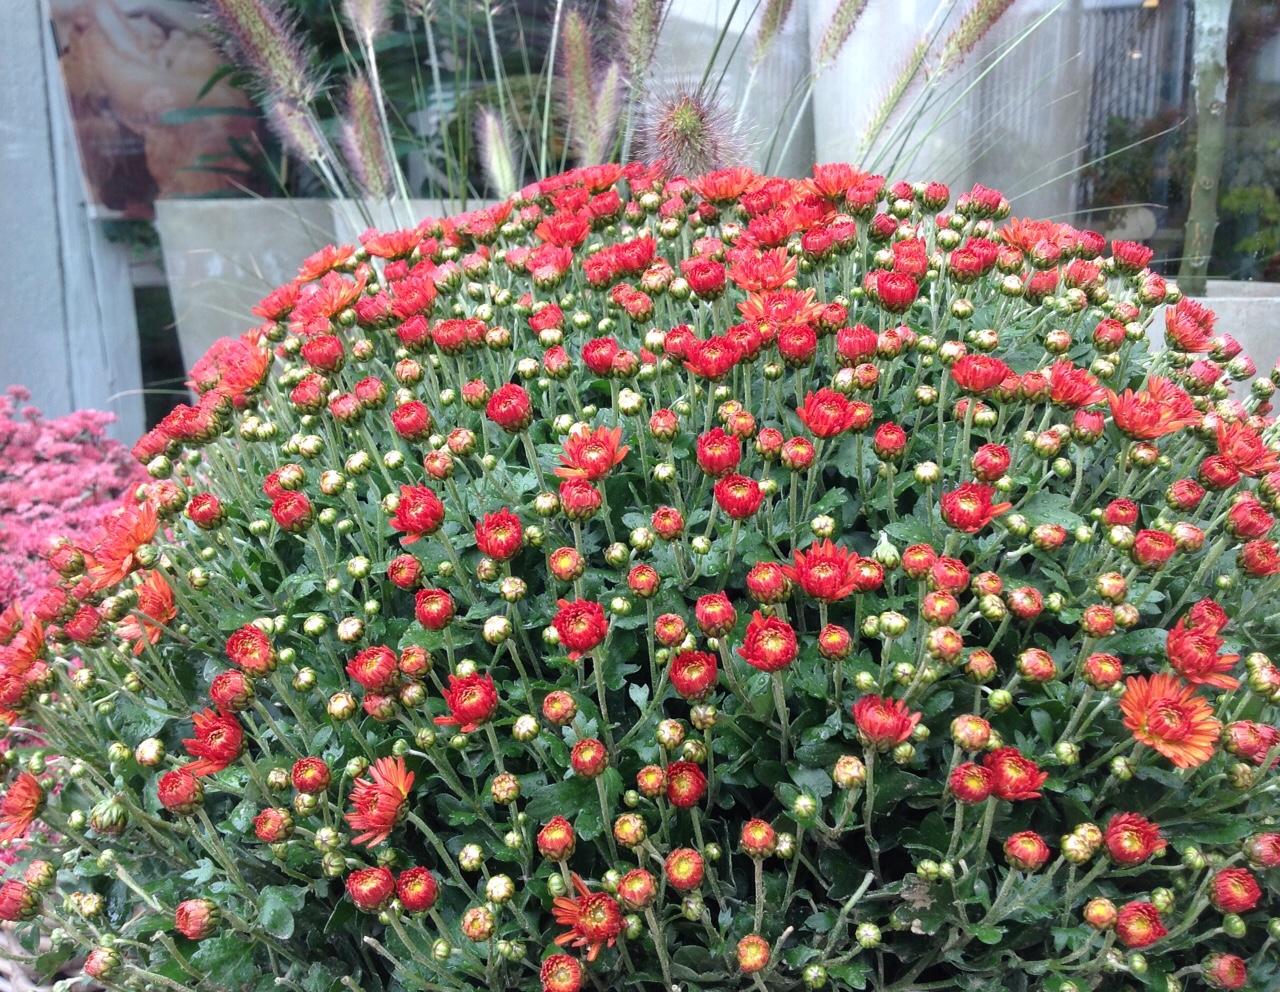 2017 BLUMEN RAMPP Herbst Chrysanthemenbusch